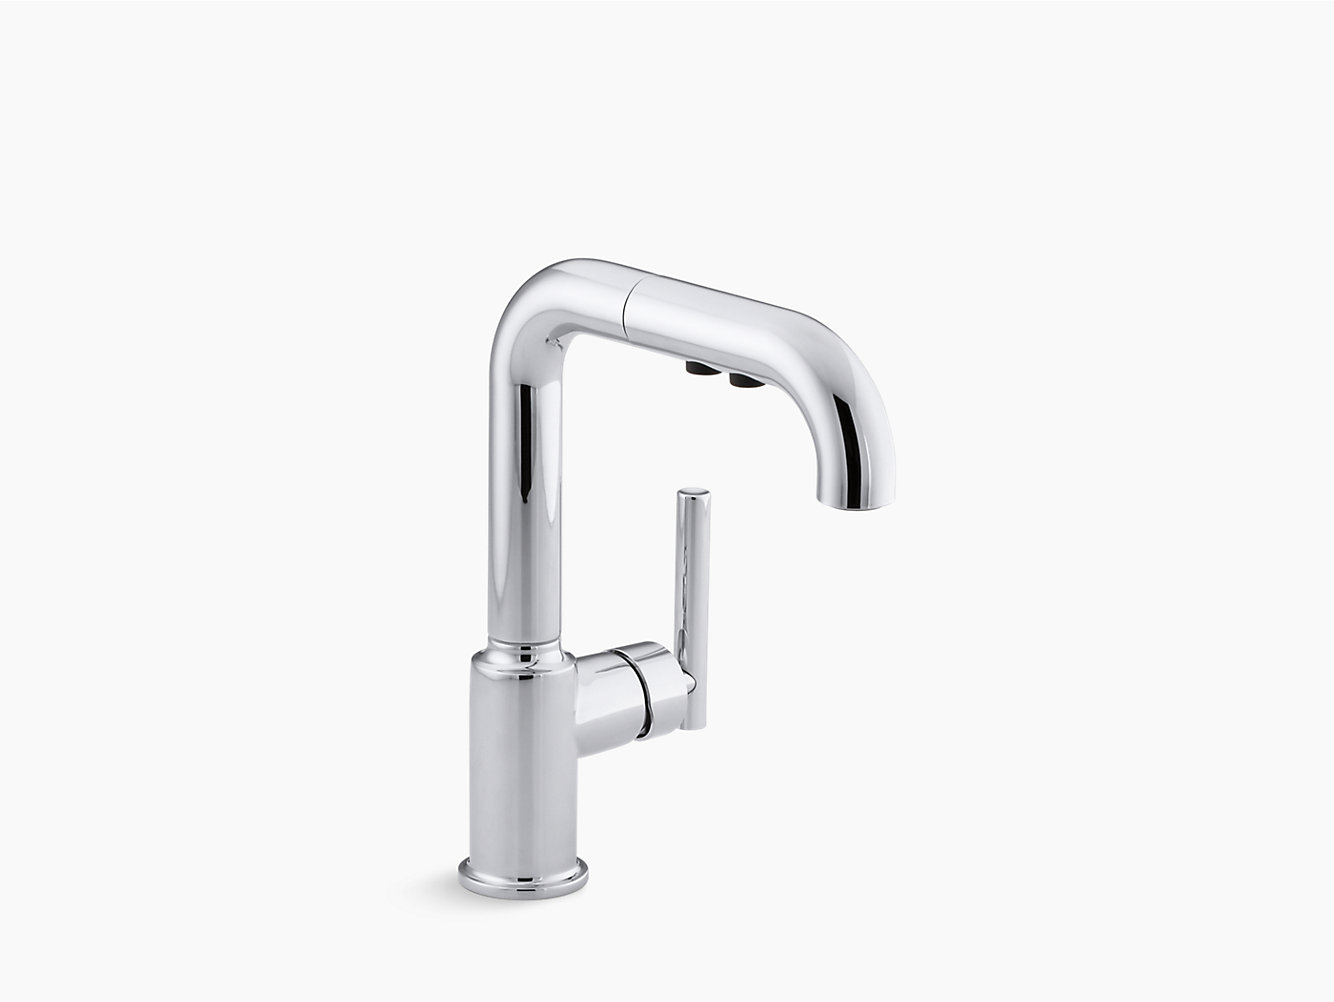 K-7506 | Purist Single-Handle Pull-out Spray Bar Sink Faucet | KOHLER